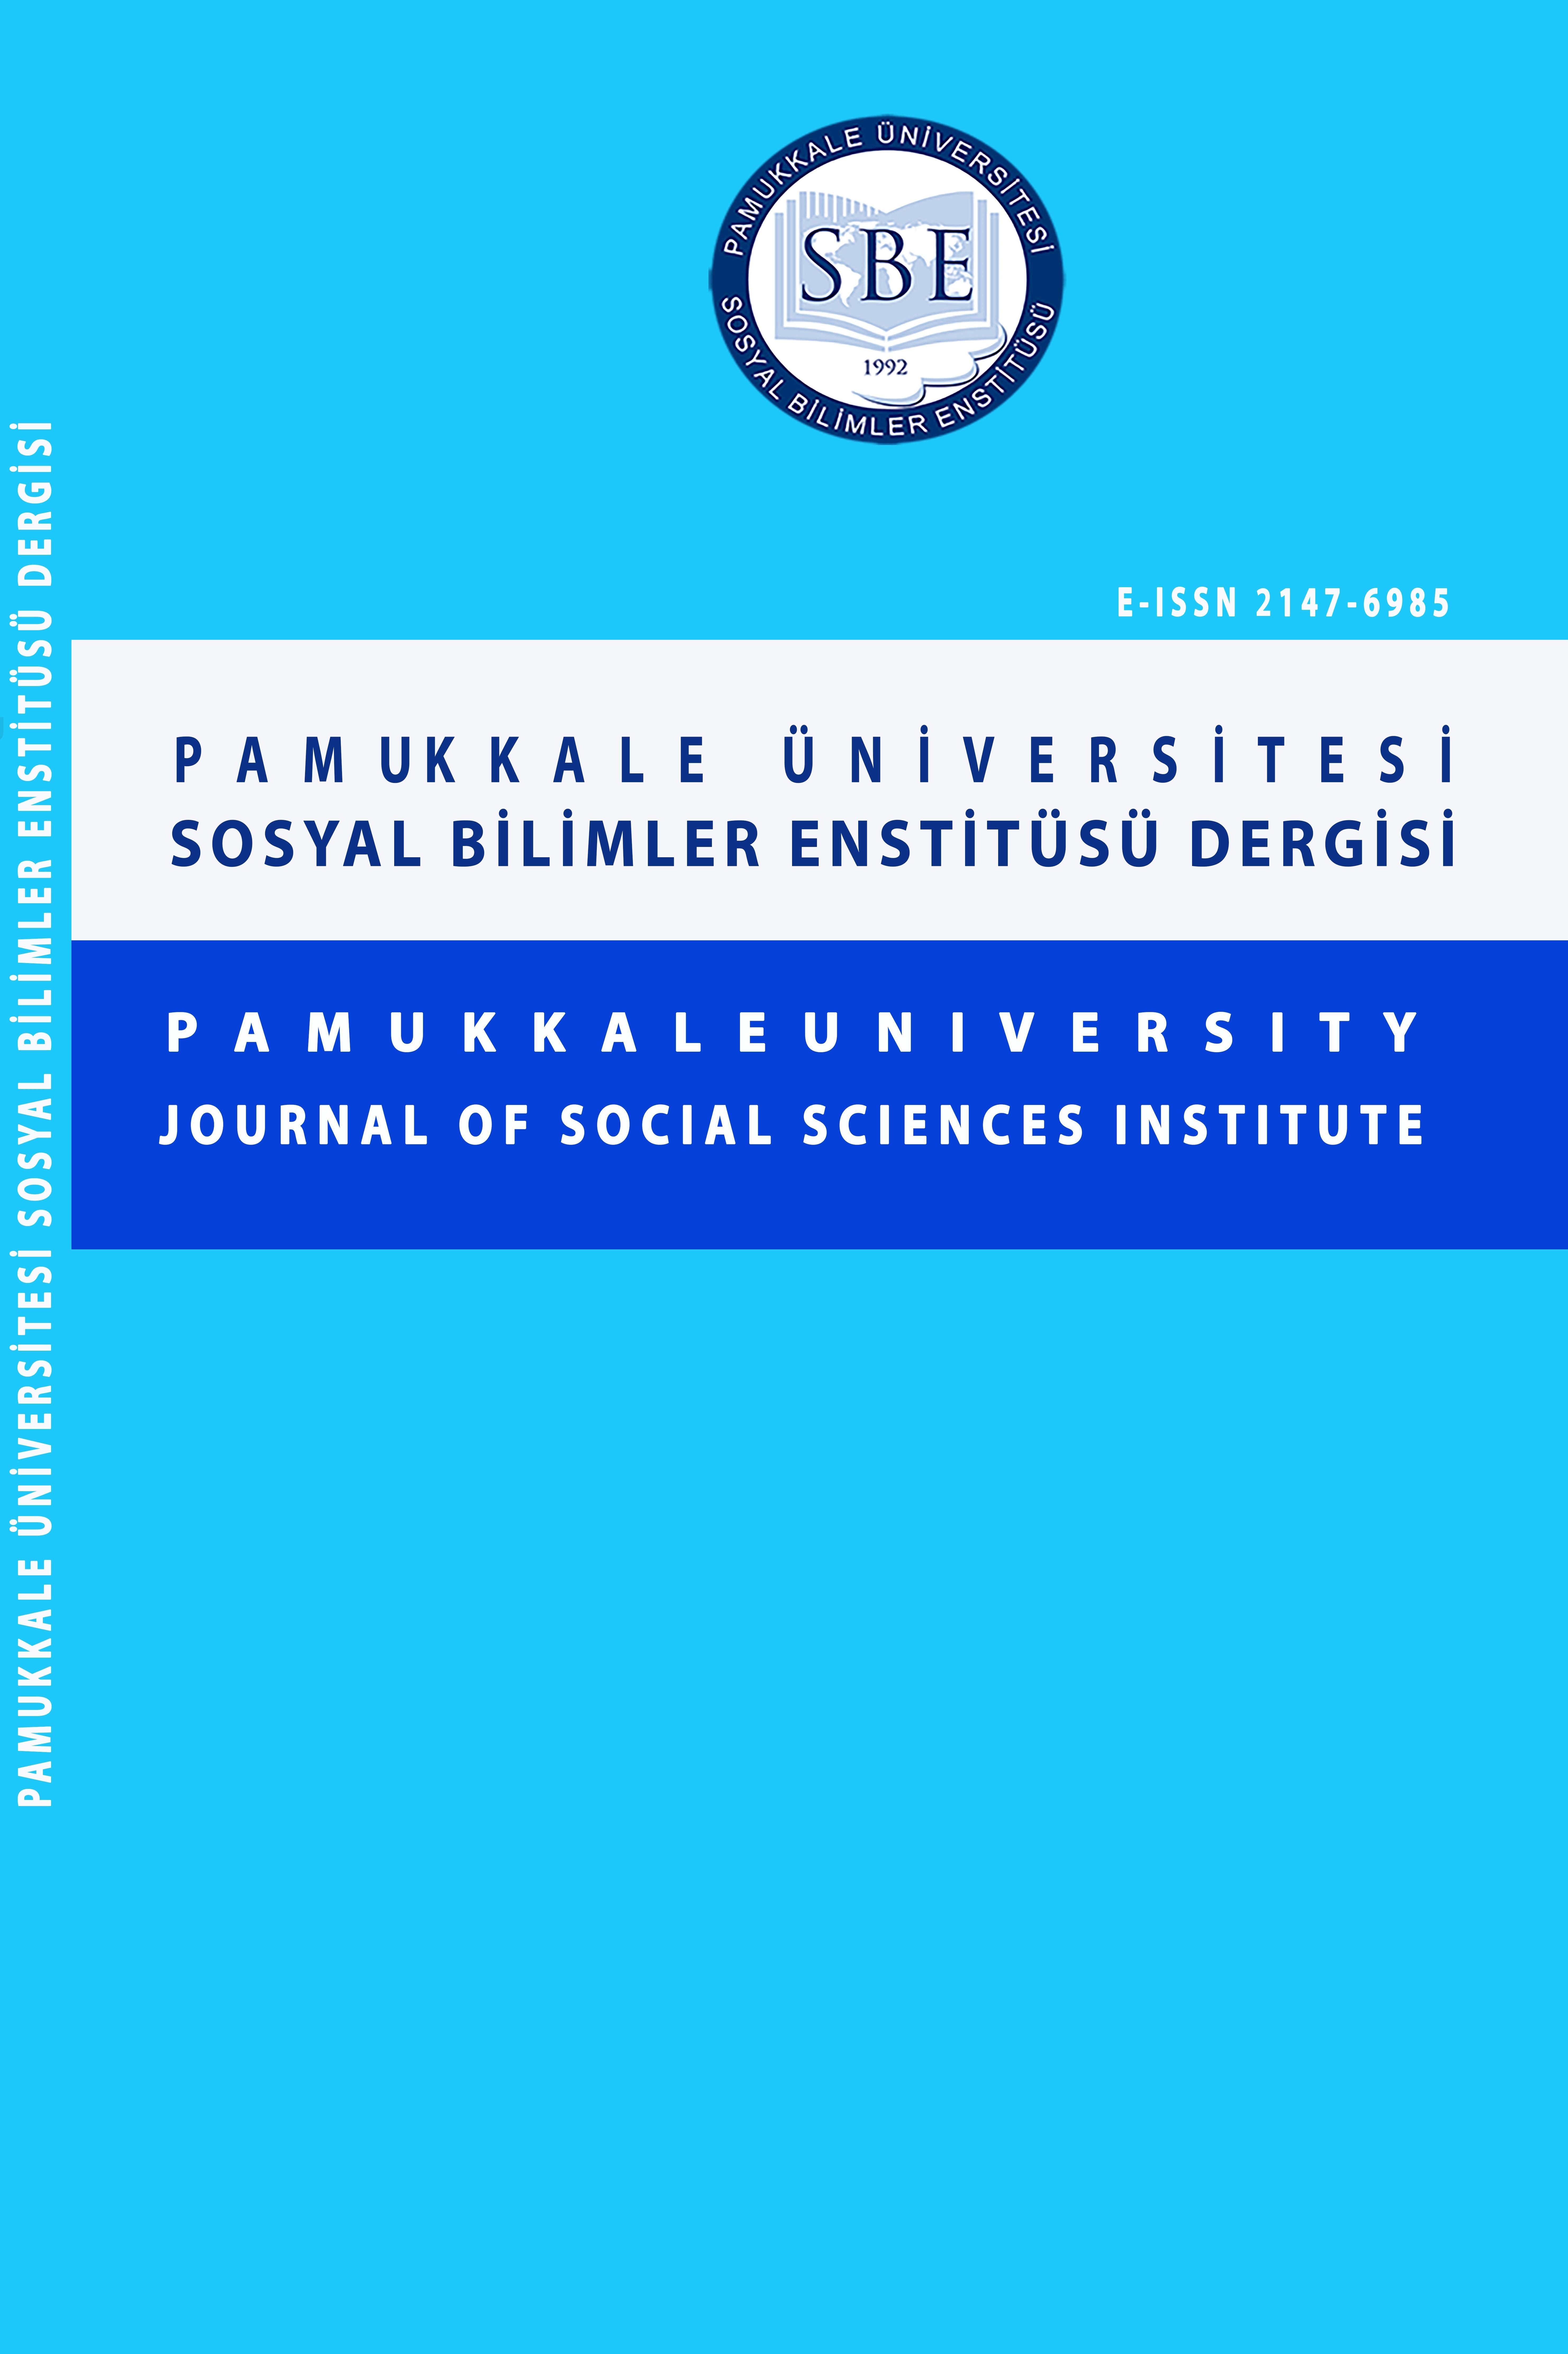 Pamukkale University Journal of Social Sciences Institute